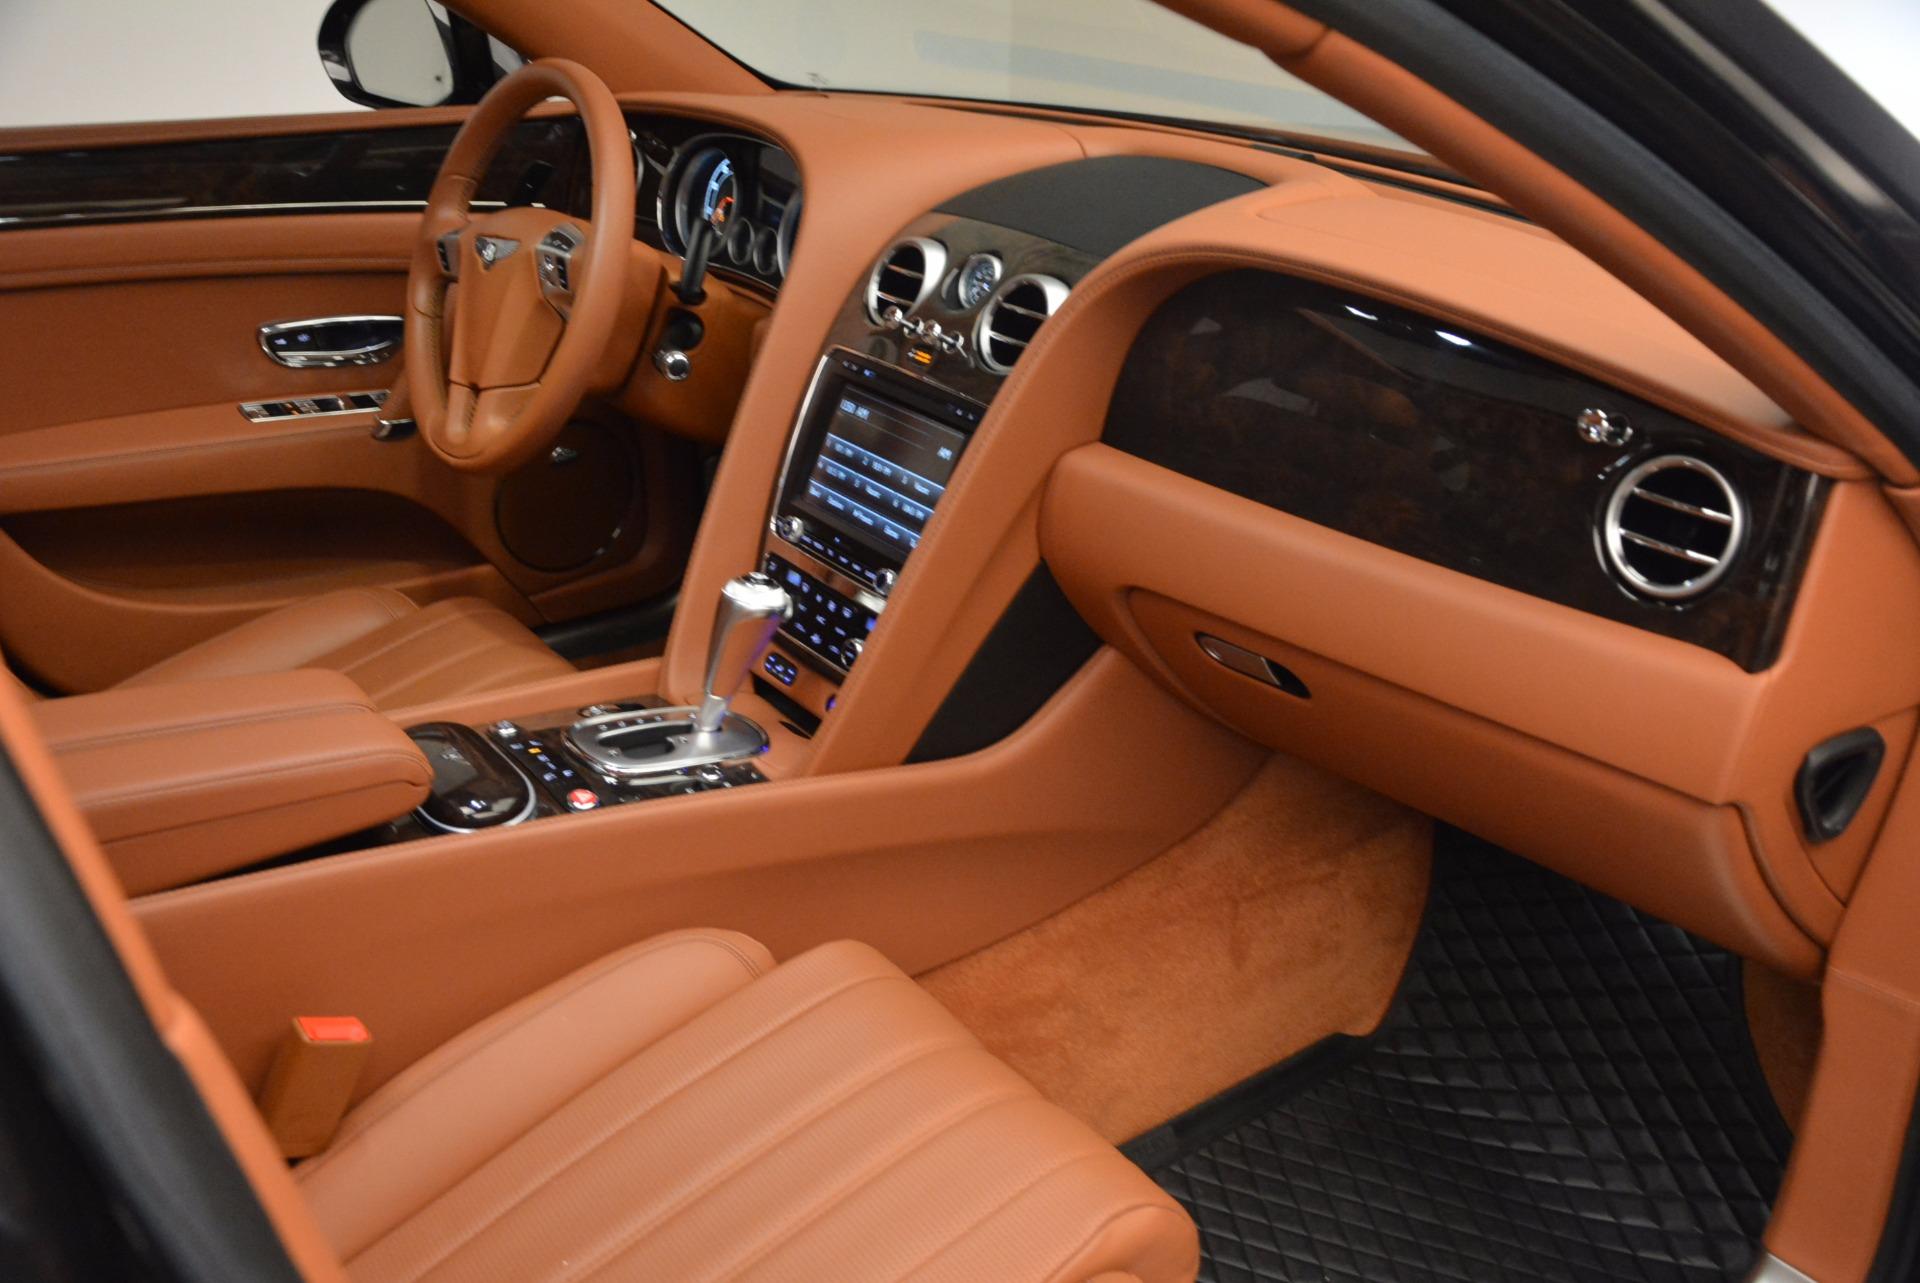 Used 2014 Bentley Flying Spur W12 For Sale In Westport, CT 1598_p40